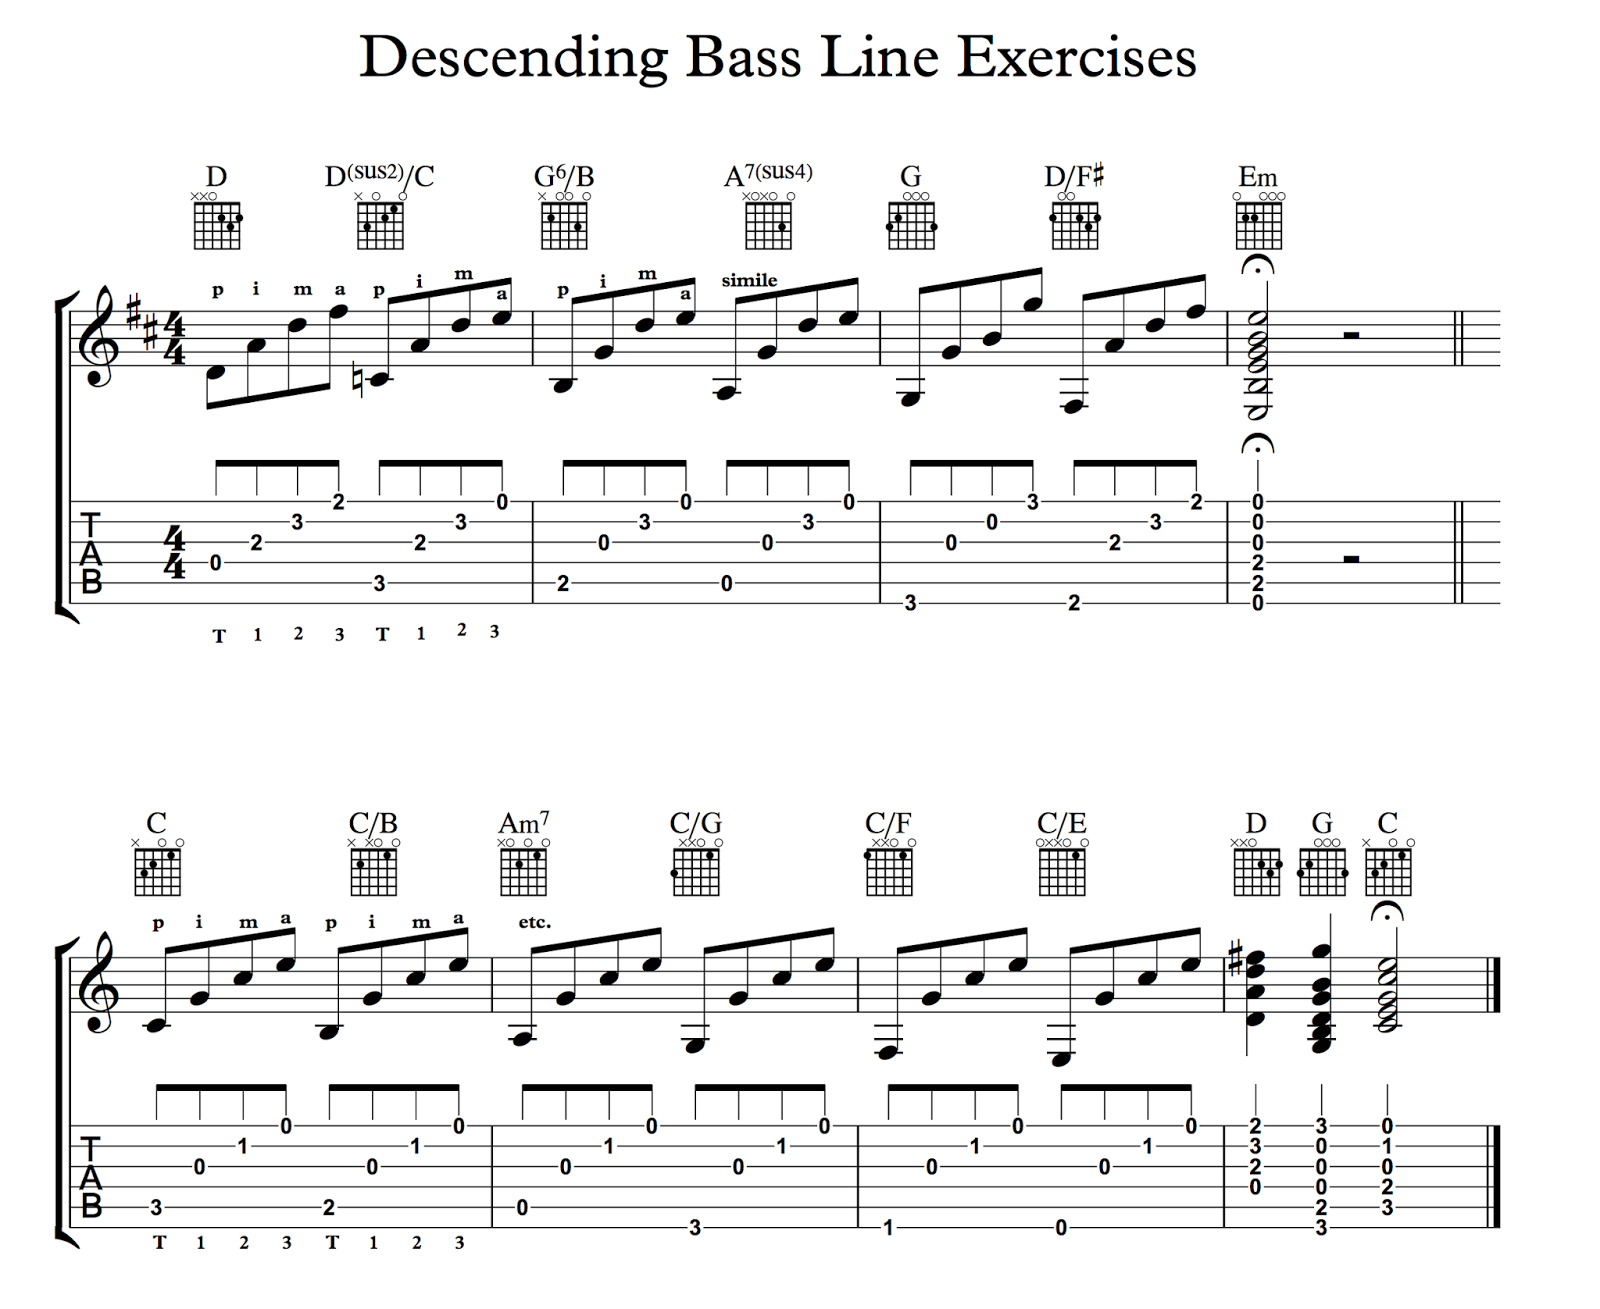 Ghs Guitar Descending Bass Line Patterns For Cool Guitar Players